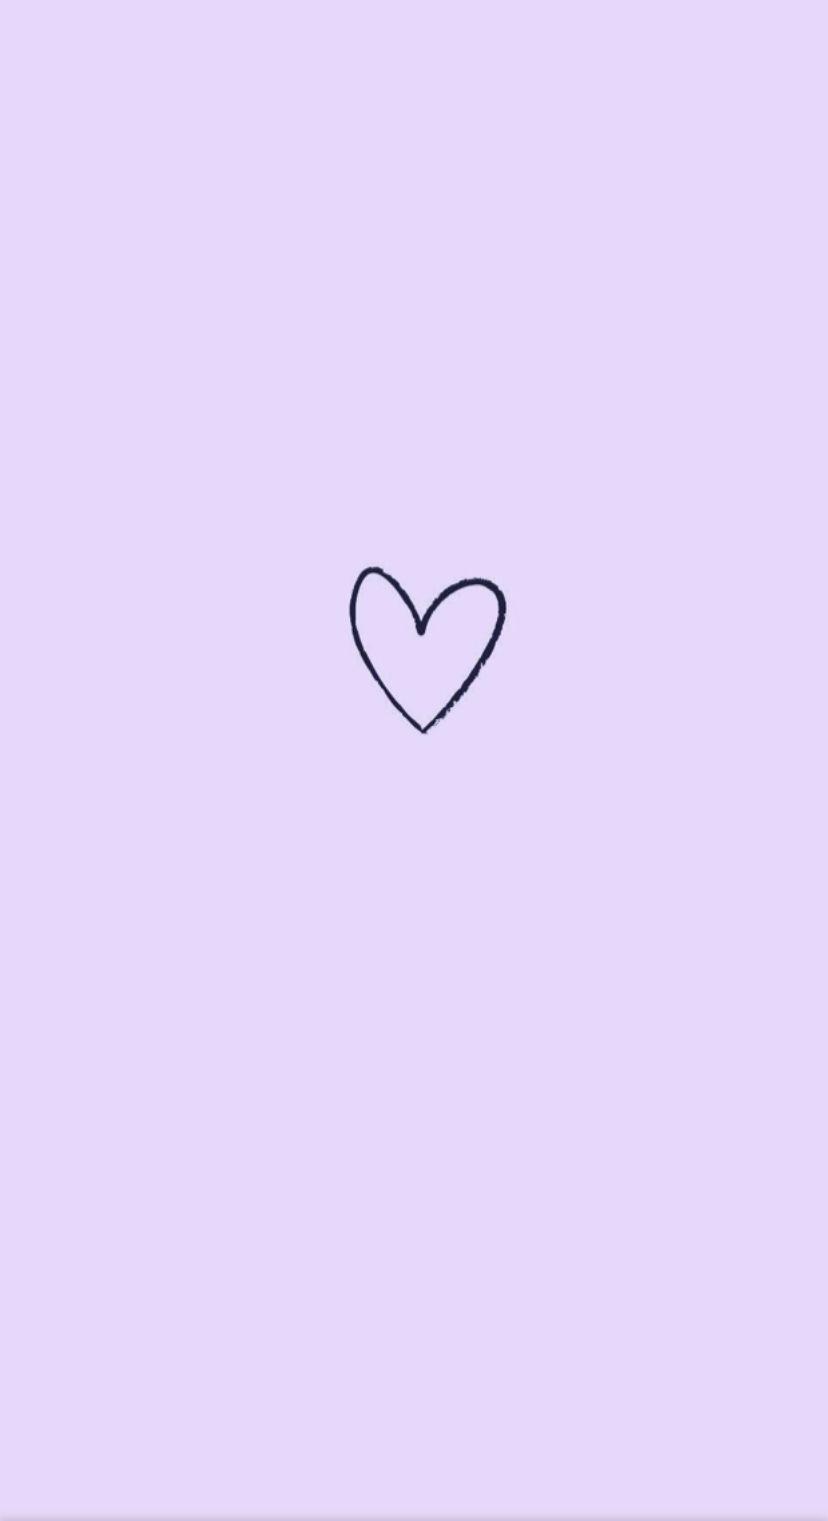 The Lavender Heart Purple Wallpaper Iphone Heart Wallpaper Iphone Wallpaper Images